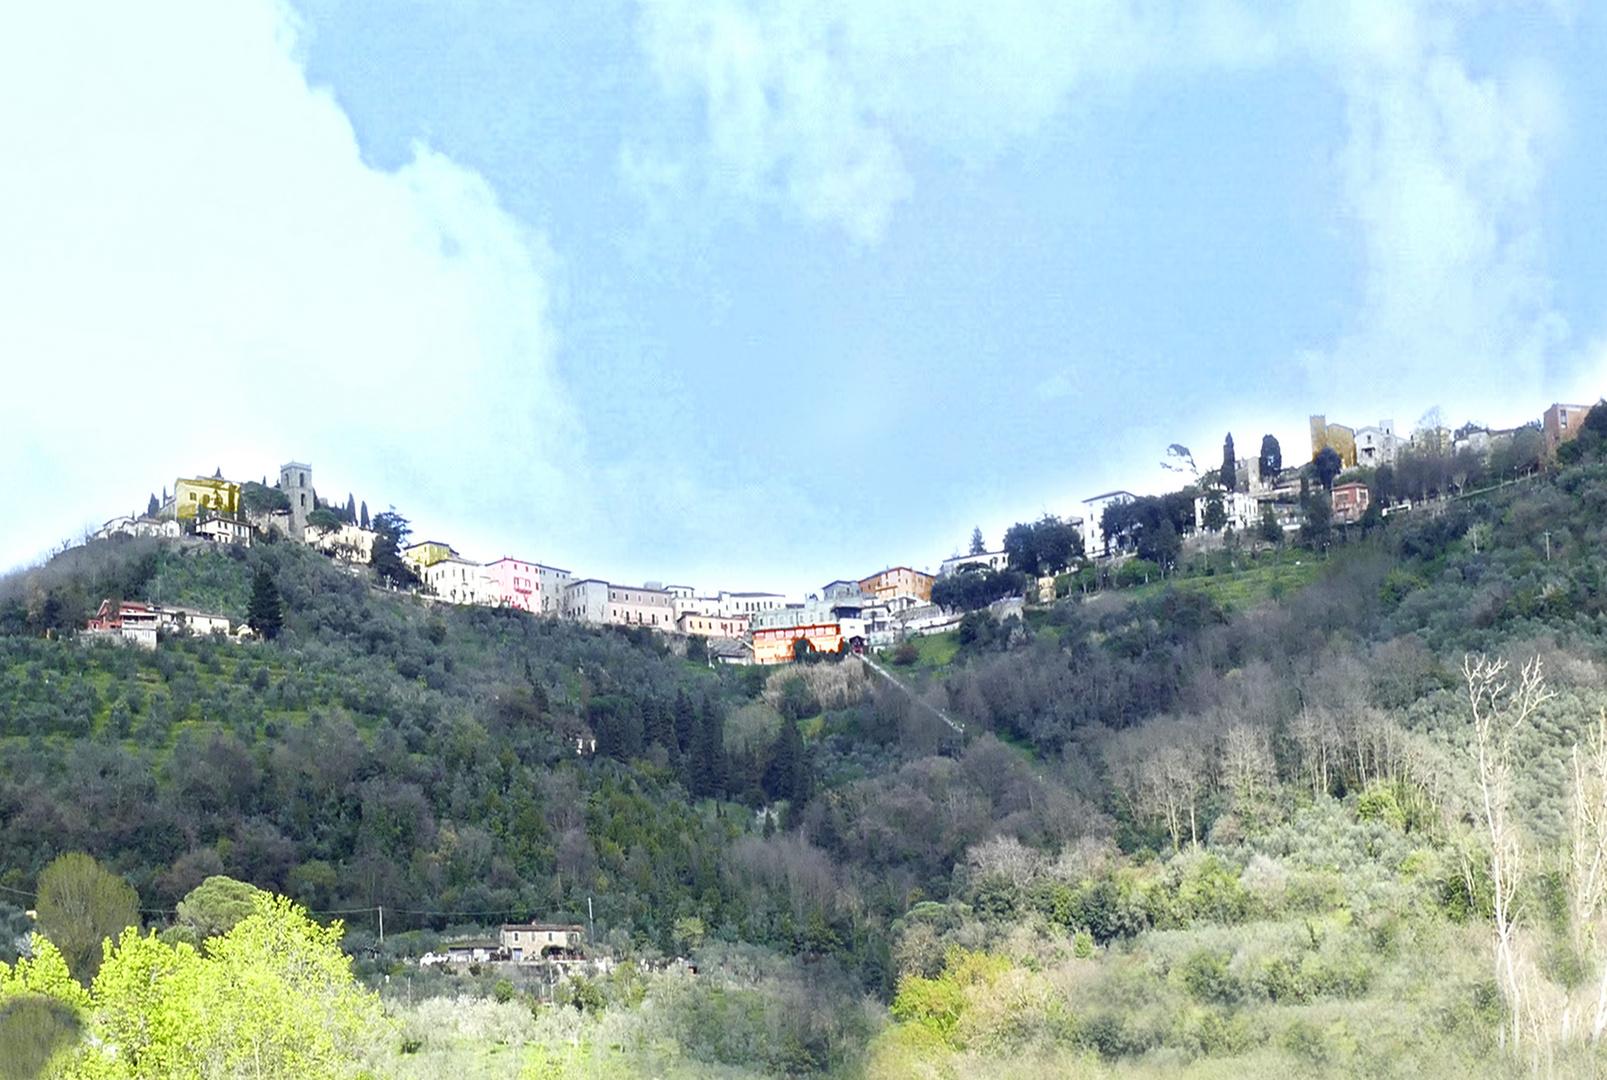 Direccion al funicular Montecatini Terma